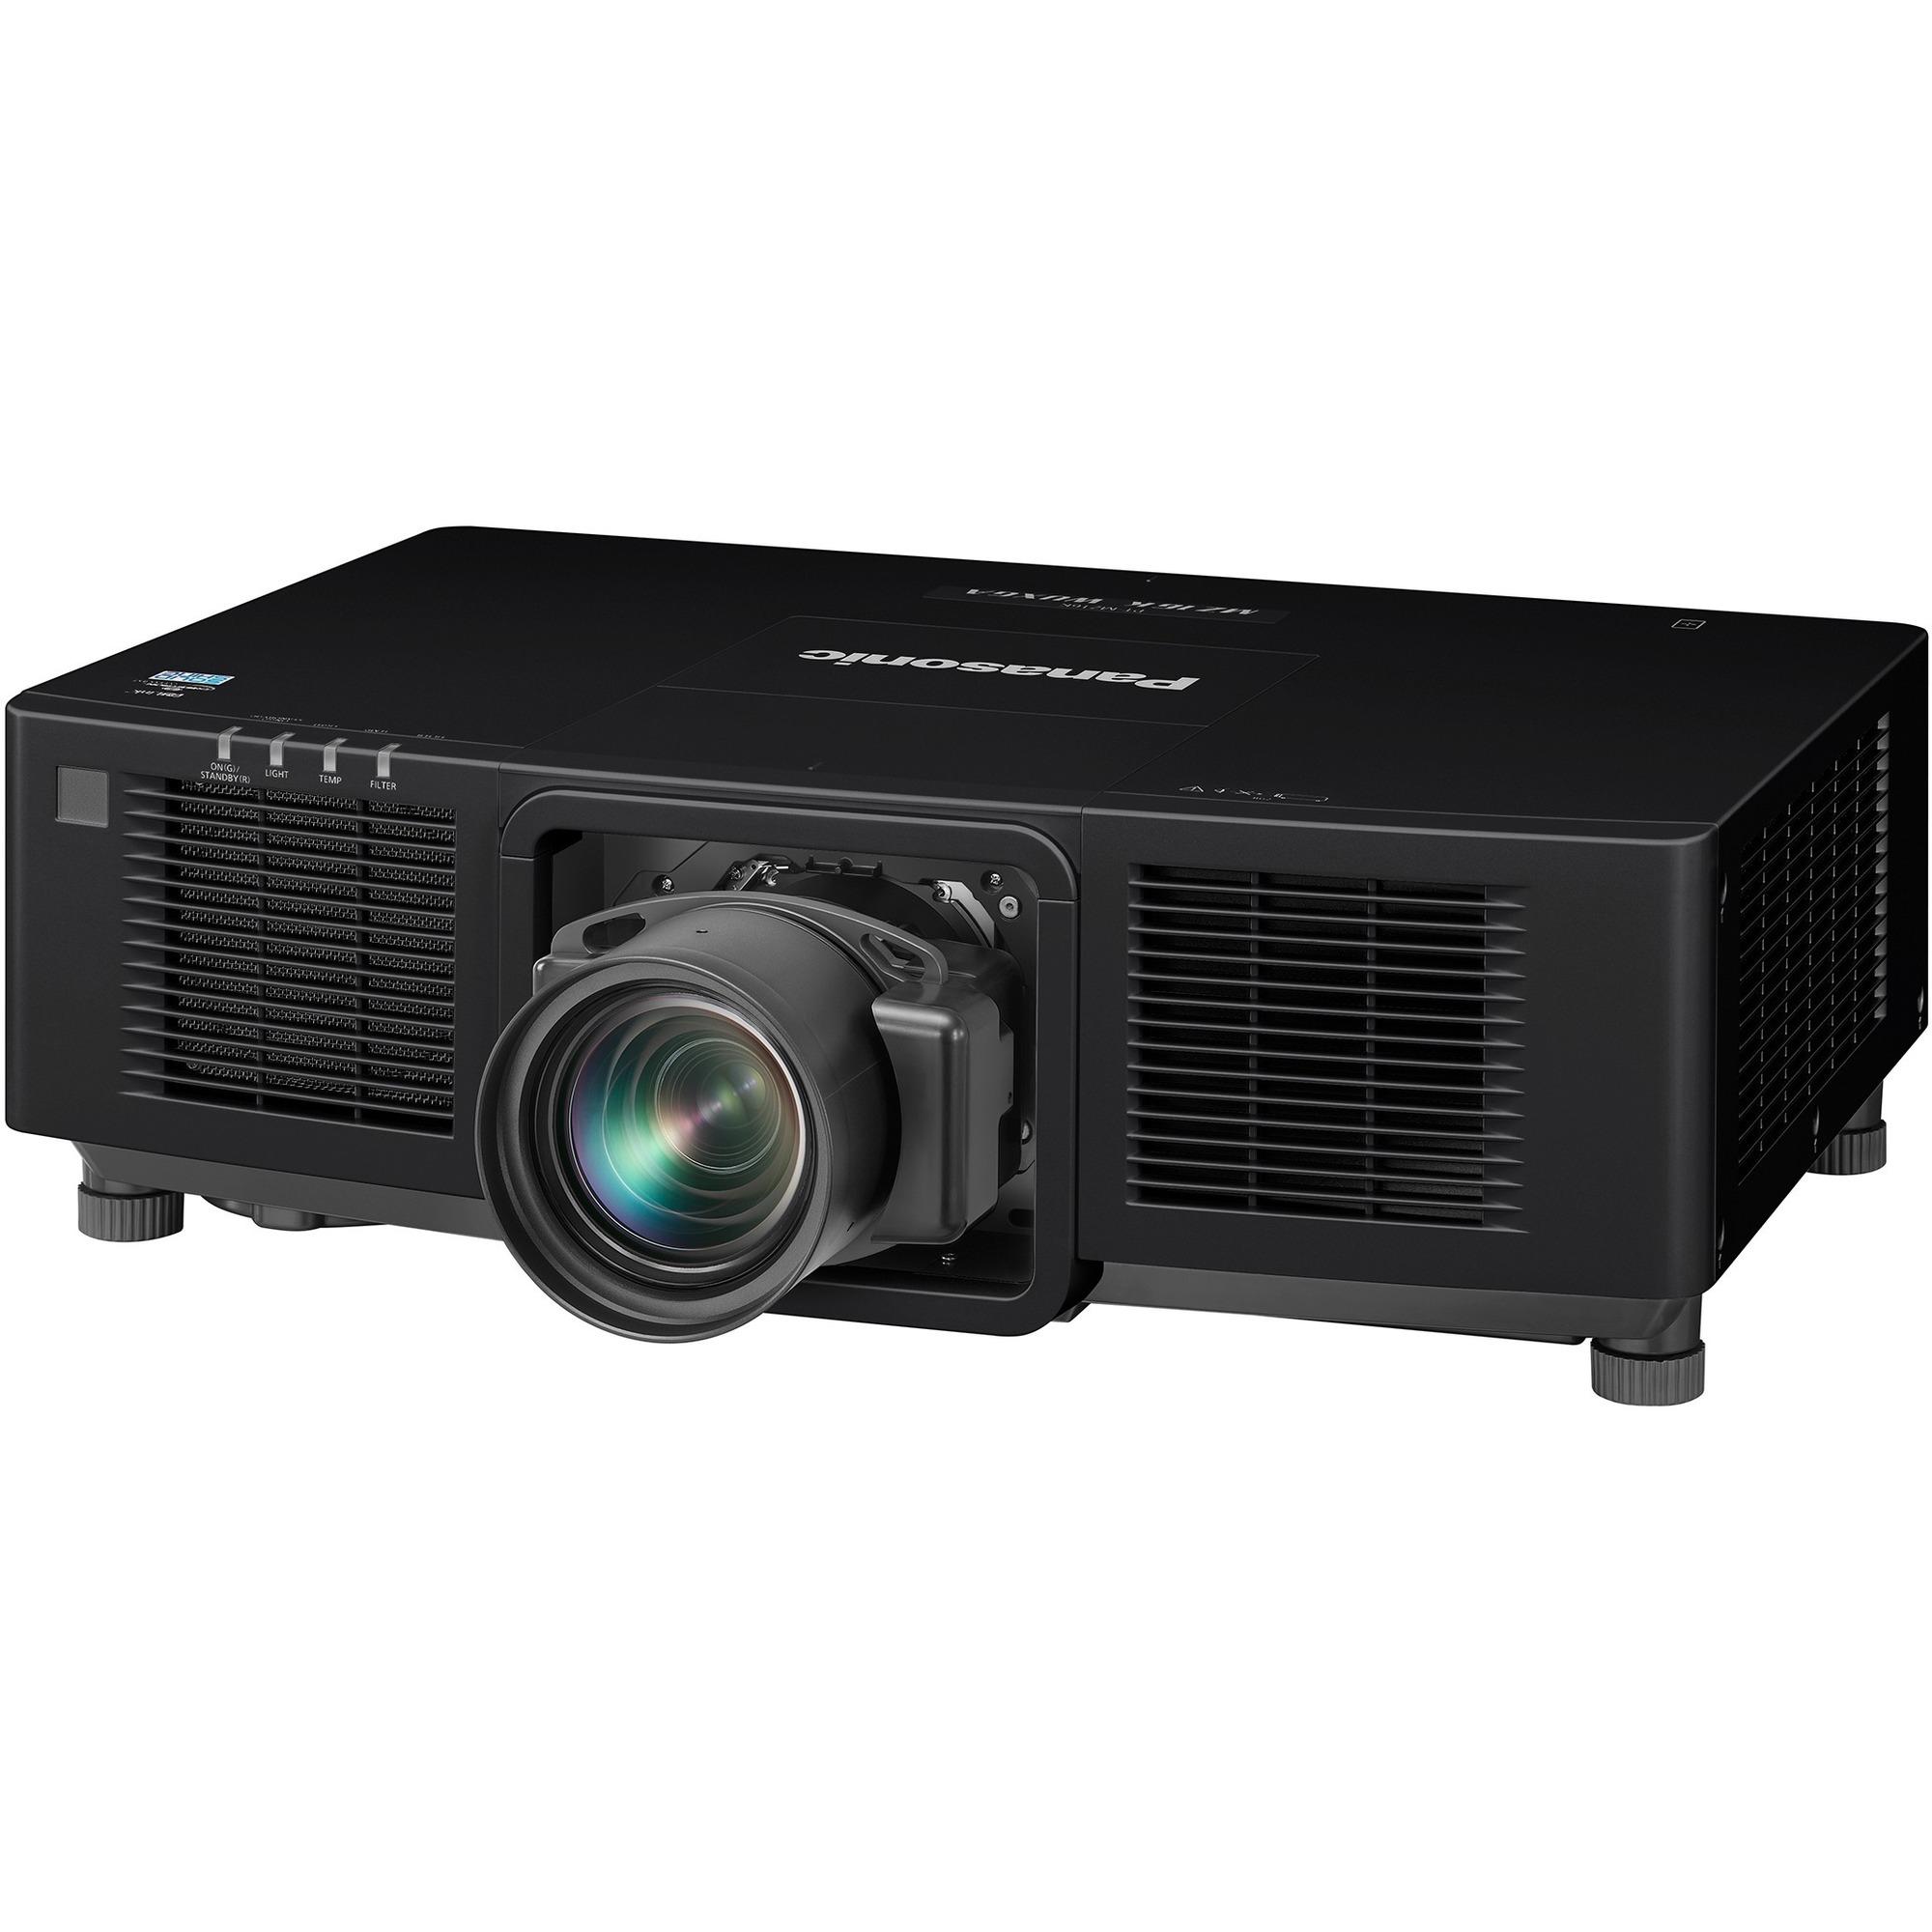 Panasonic SOLID SHINE PT-MZ10KL 3LCD Projector - 16:10 - Black_subImage_1